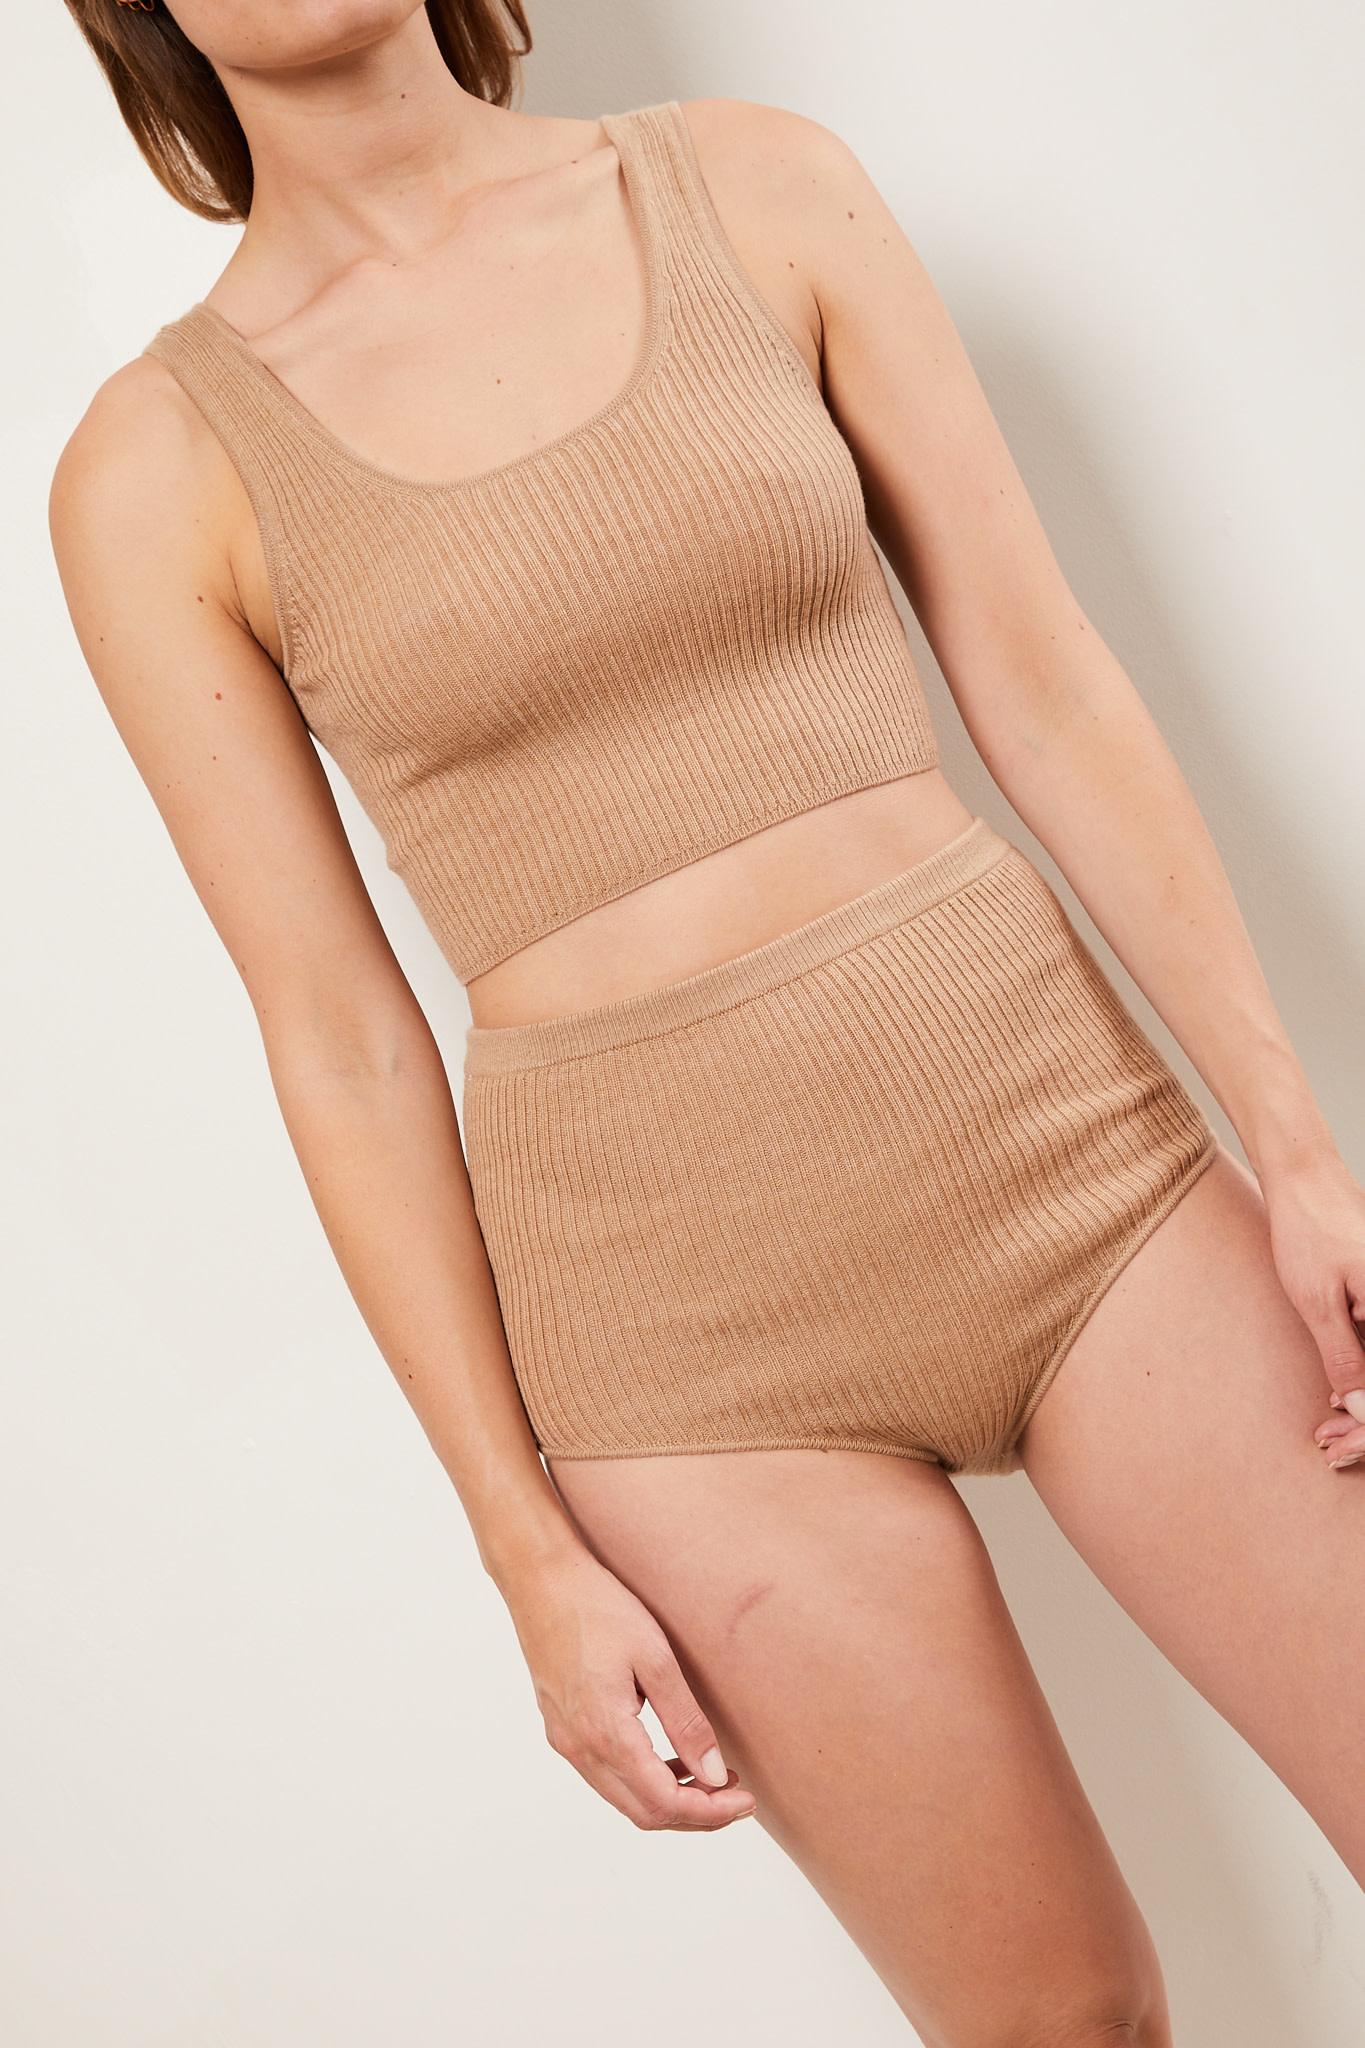 loulou studio - Montague cashmere cropped top